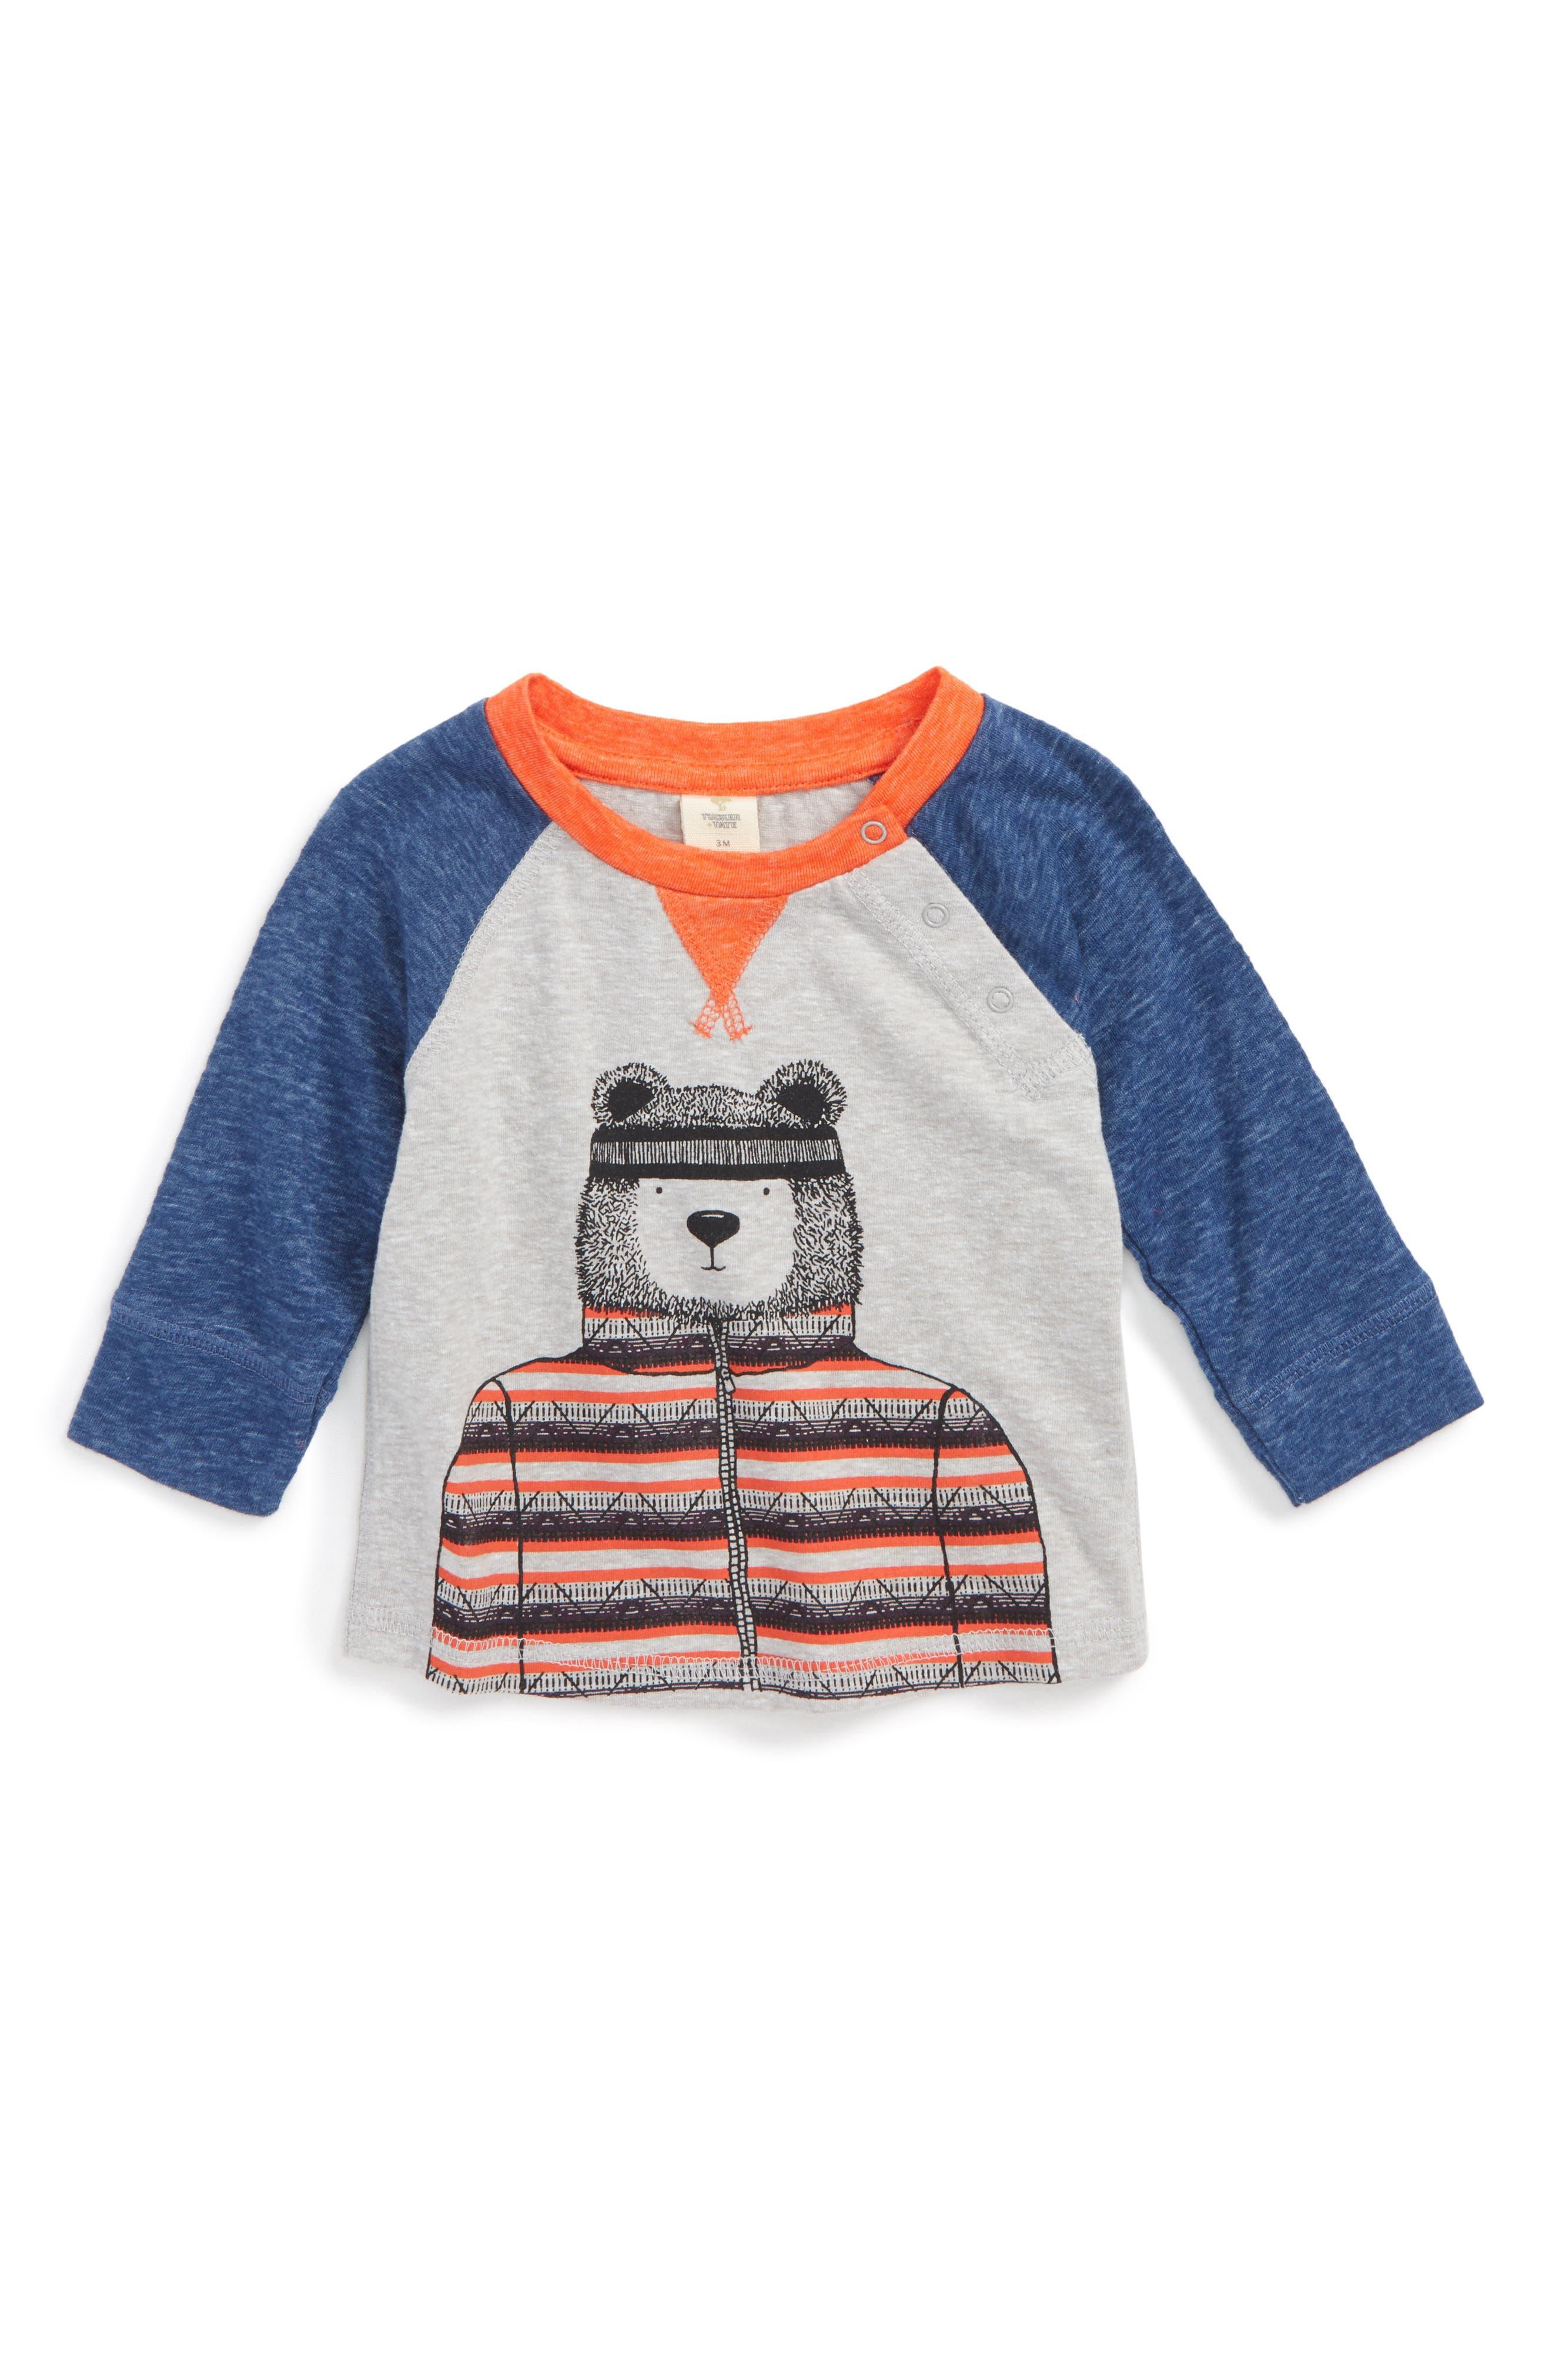 Flyaway Graphic T-Shirt,                         Main,                         color, Grey Ash Heather Bear Cub